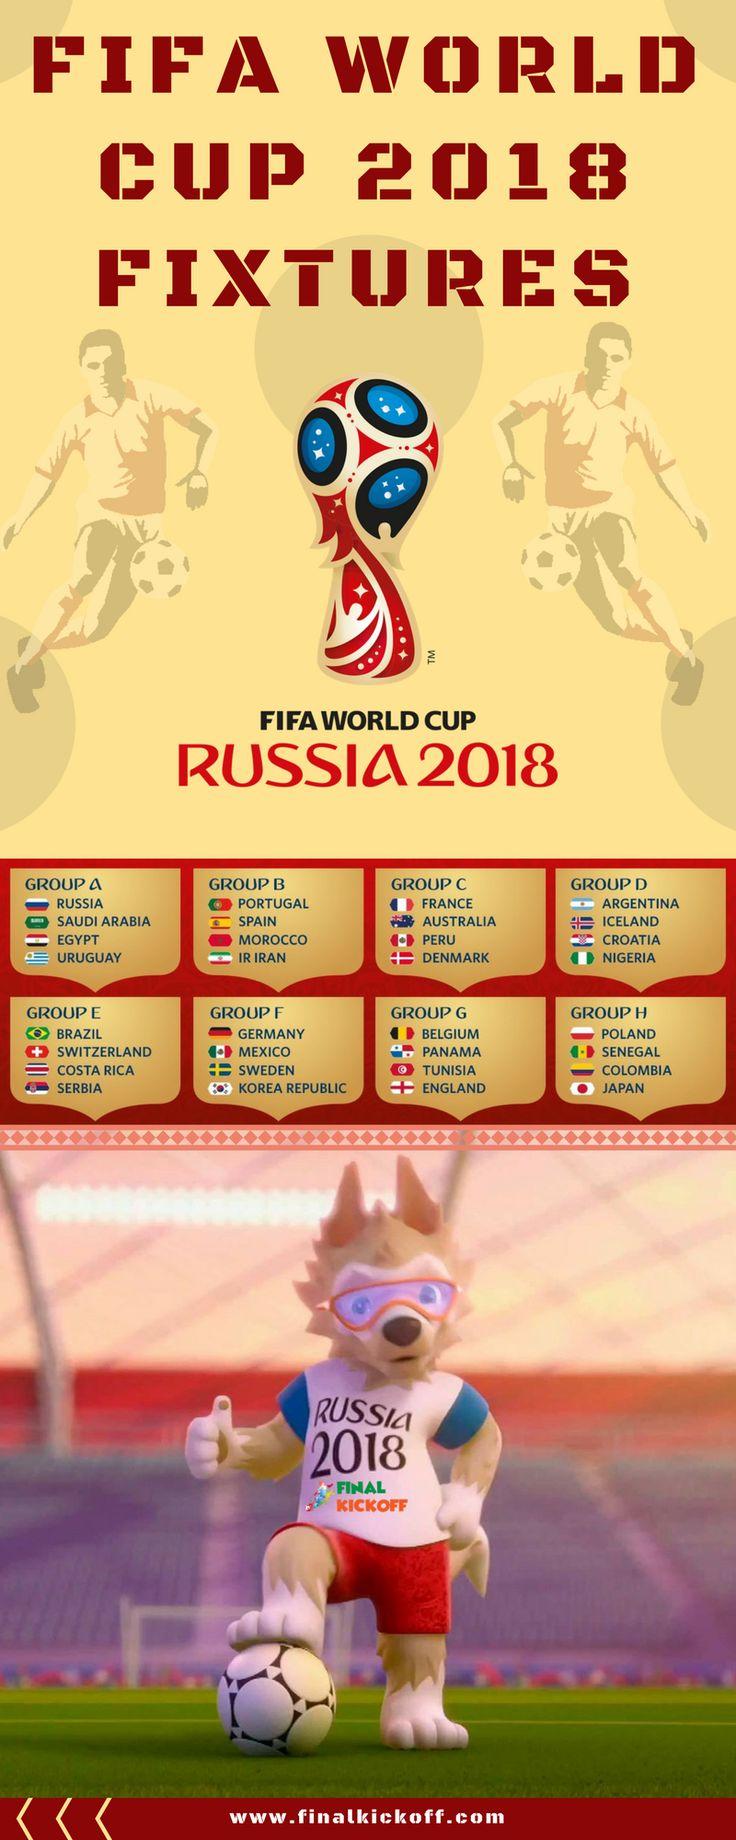 FIFA World Cup 2018 Match Schedule